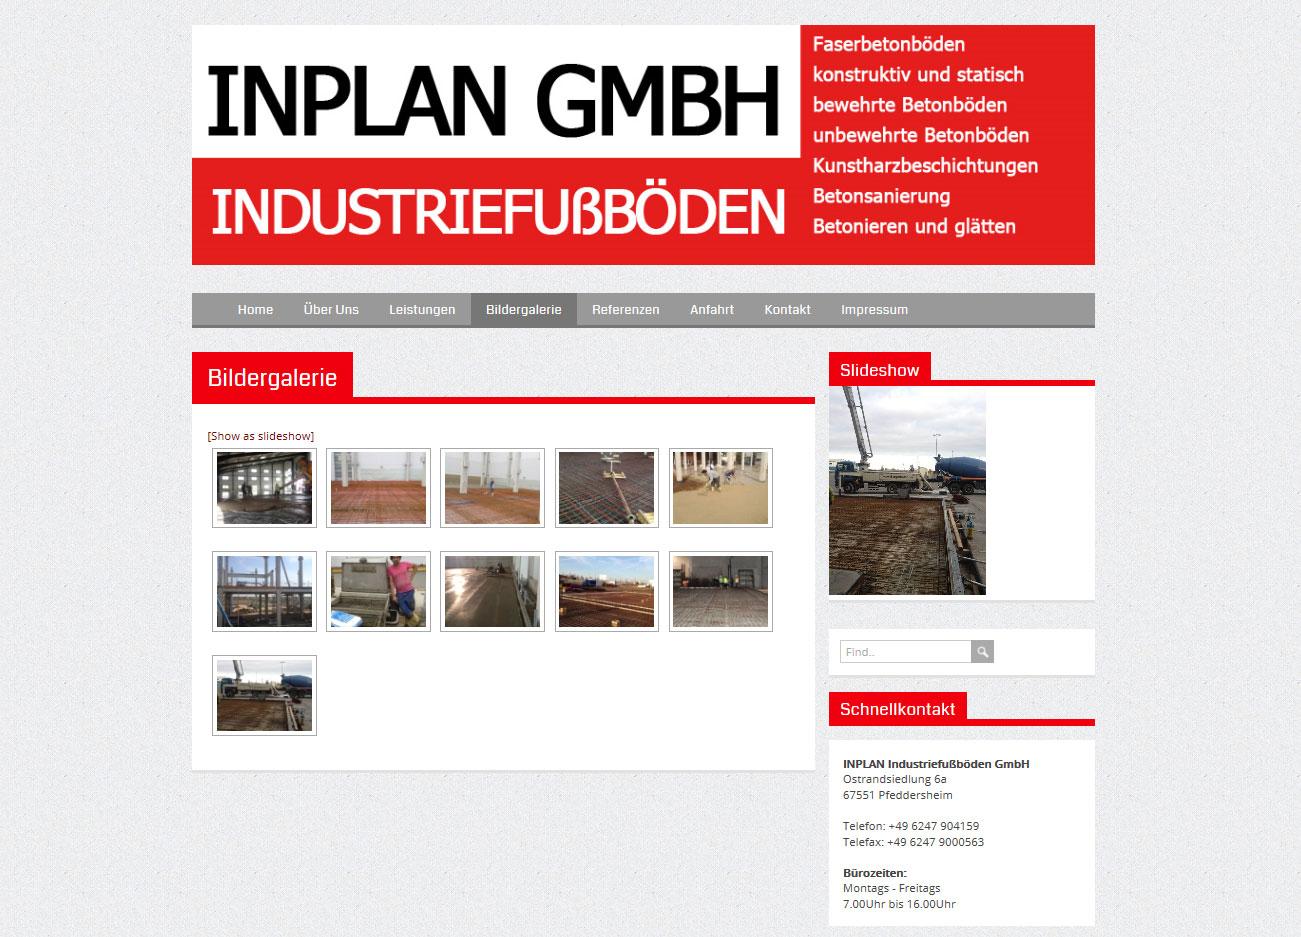 INPLAN GmbH